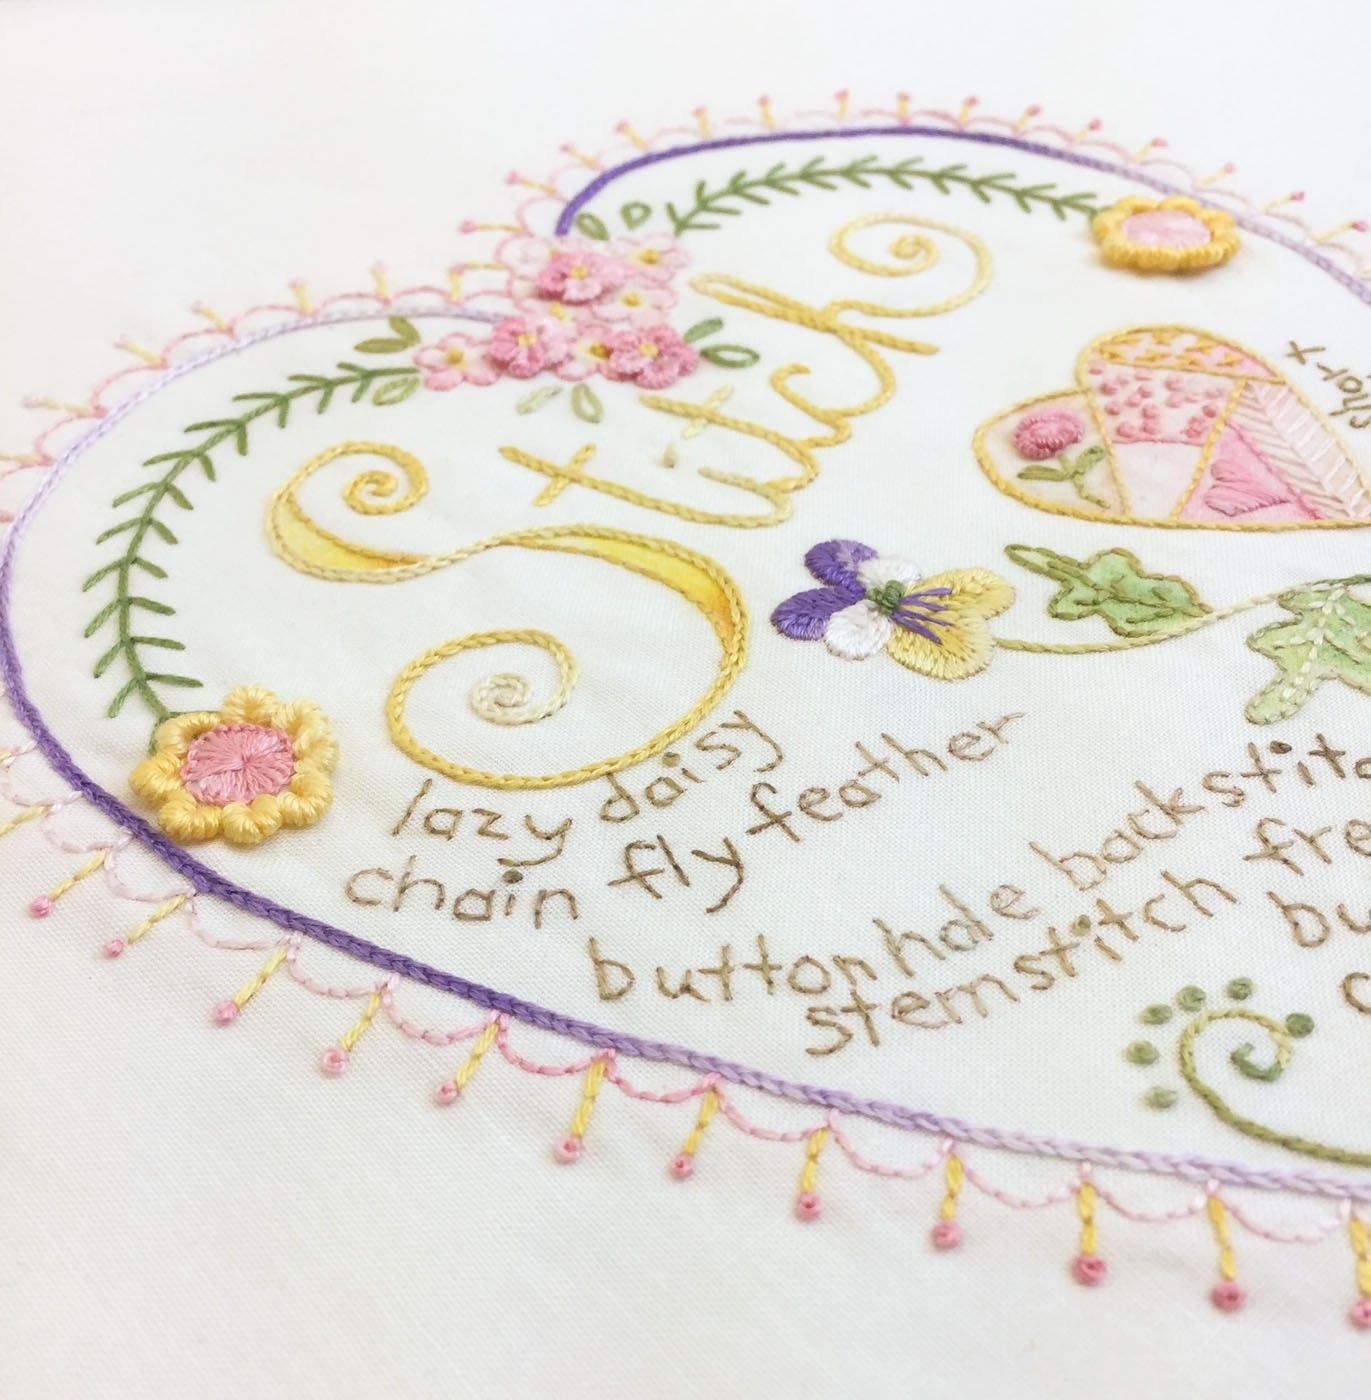 Stitch Heart Sampler crabapplehill | Embroidery | Pinterest